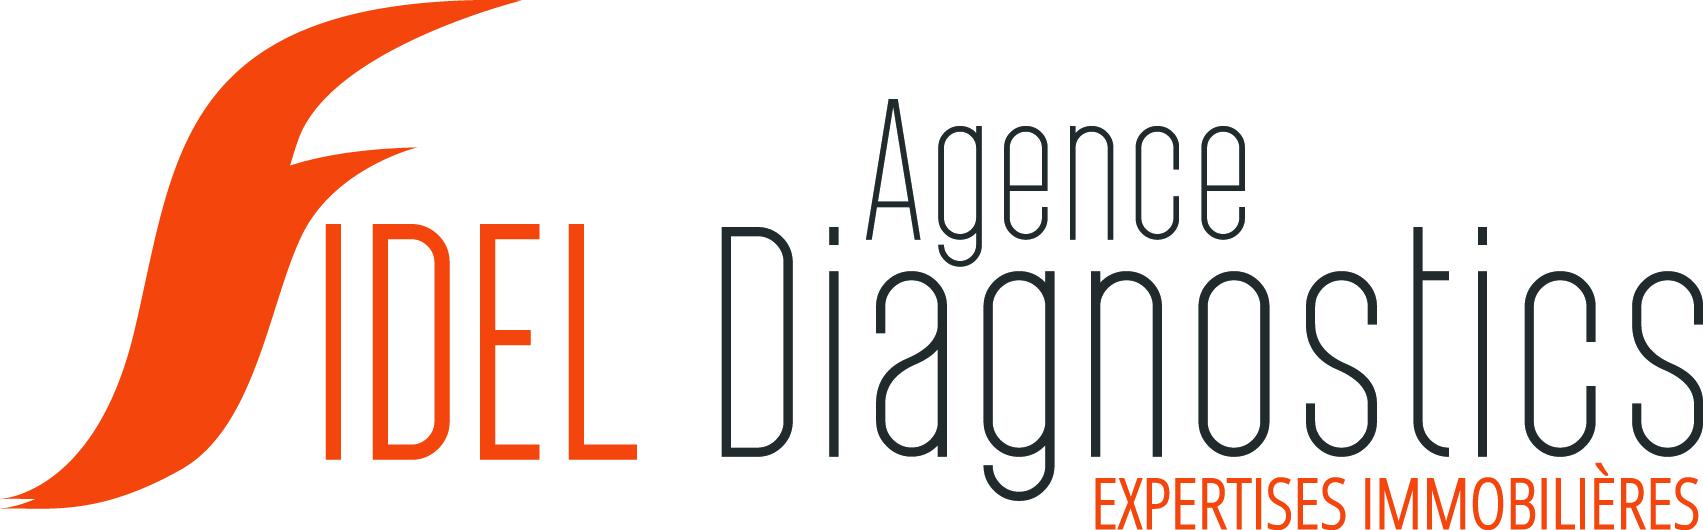 Agence FIDEL Diagnostics